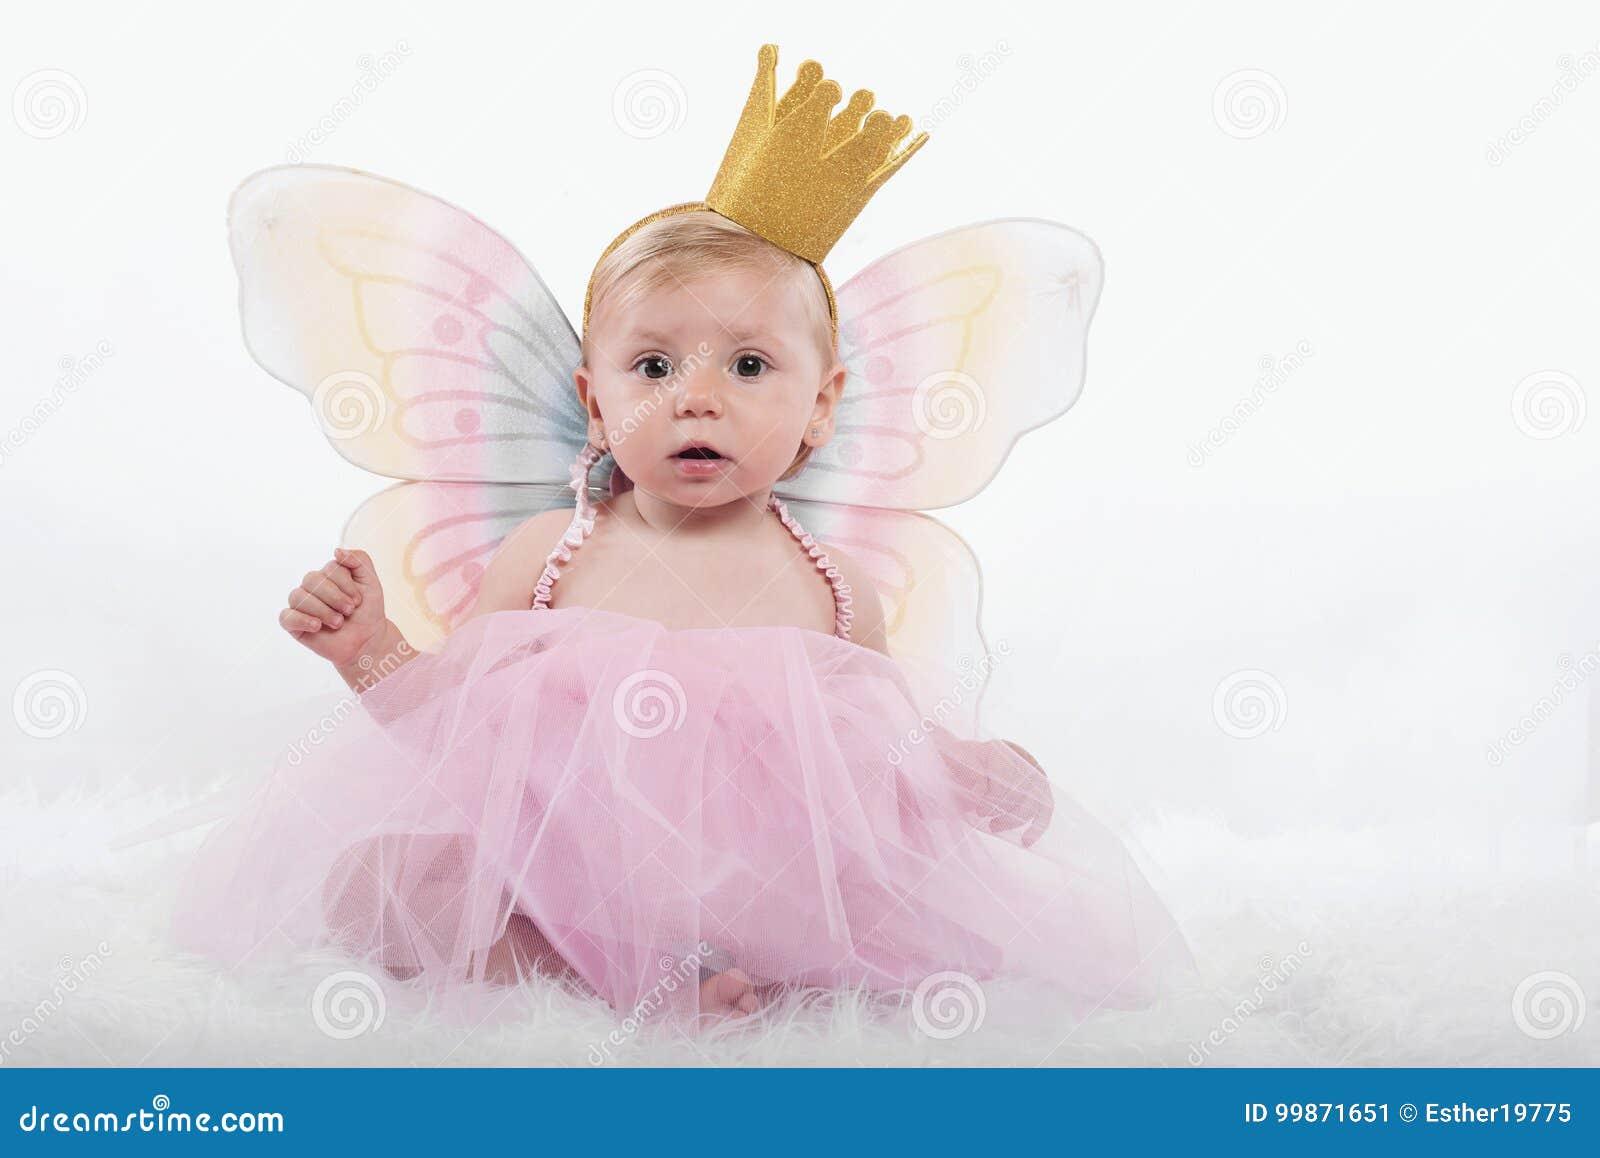 Baby girl in princess costume